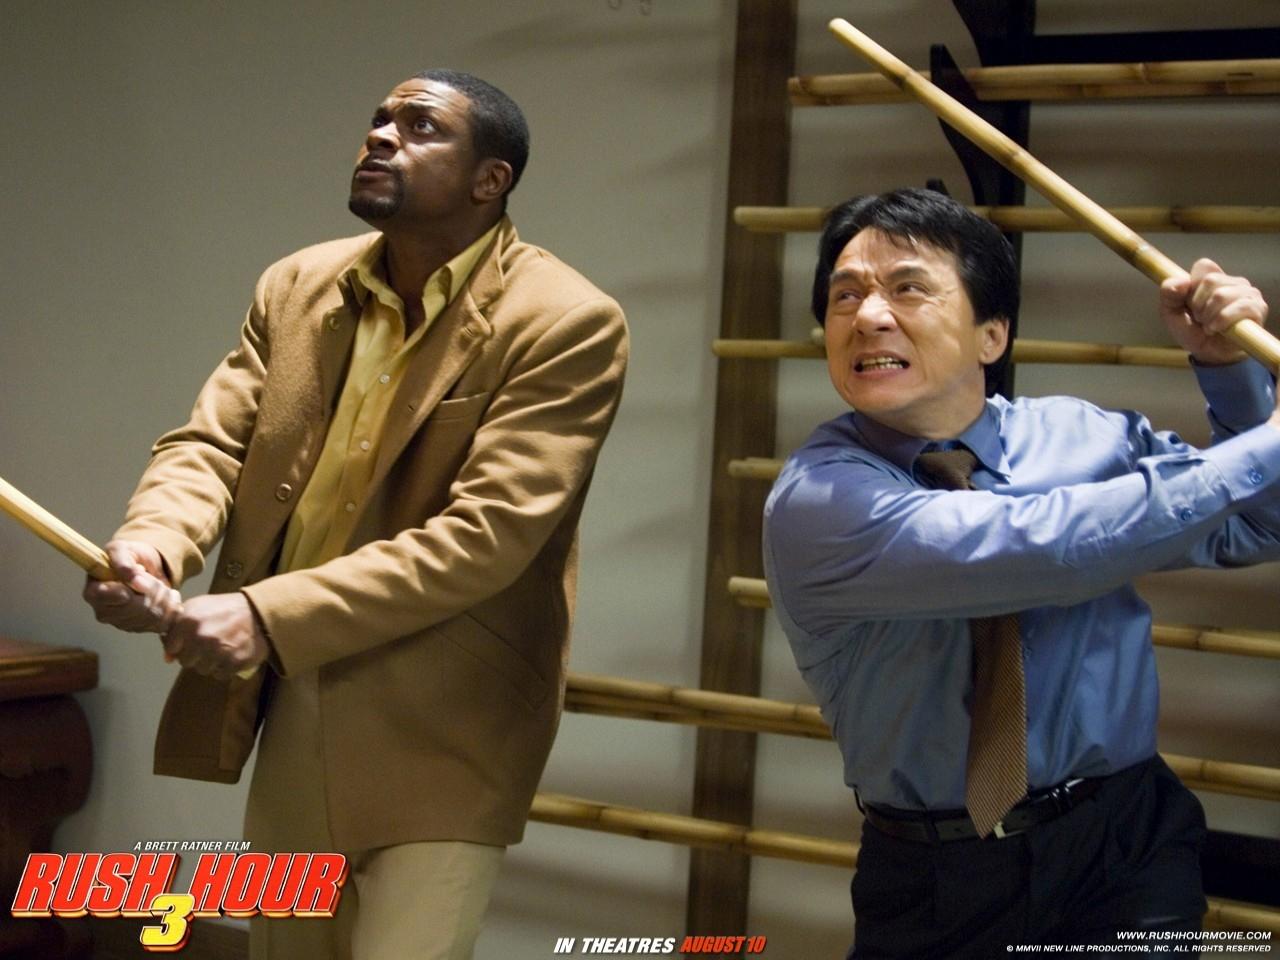 wallpaper di Jackie Chan e Chris Tucher nel film Rush Hour - Missione Parigi